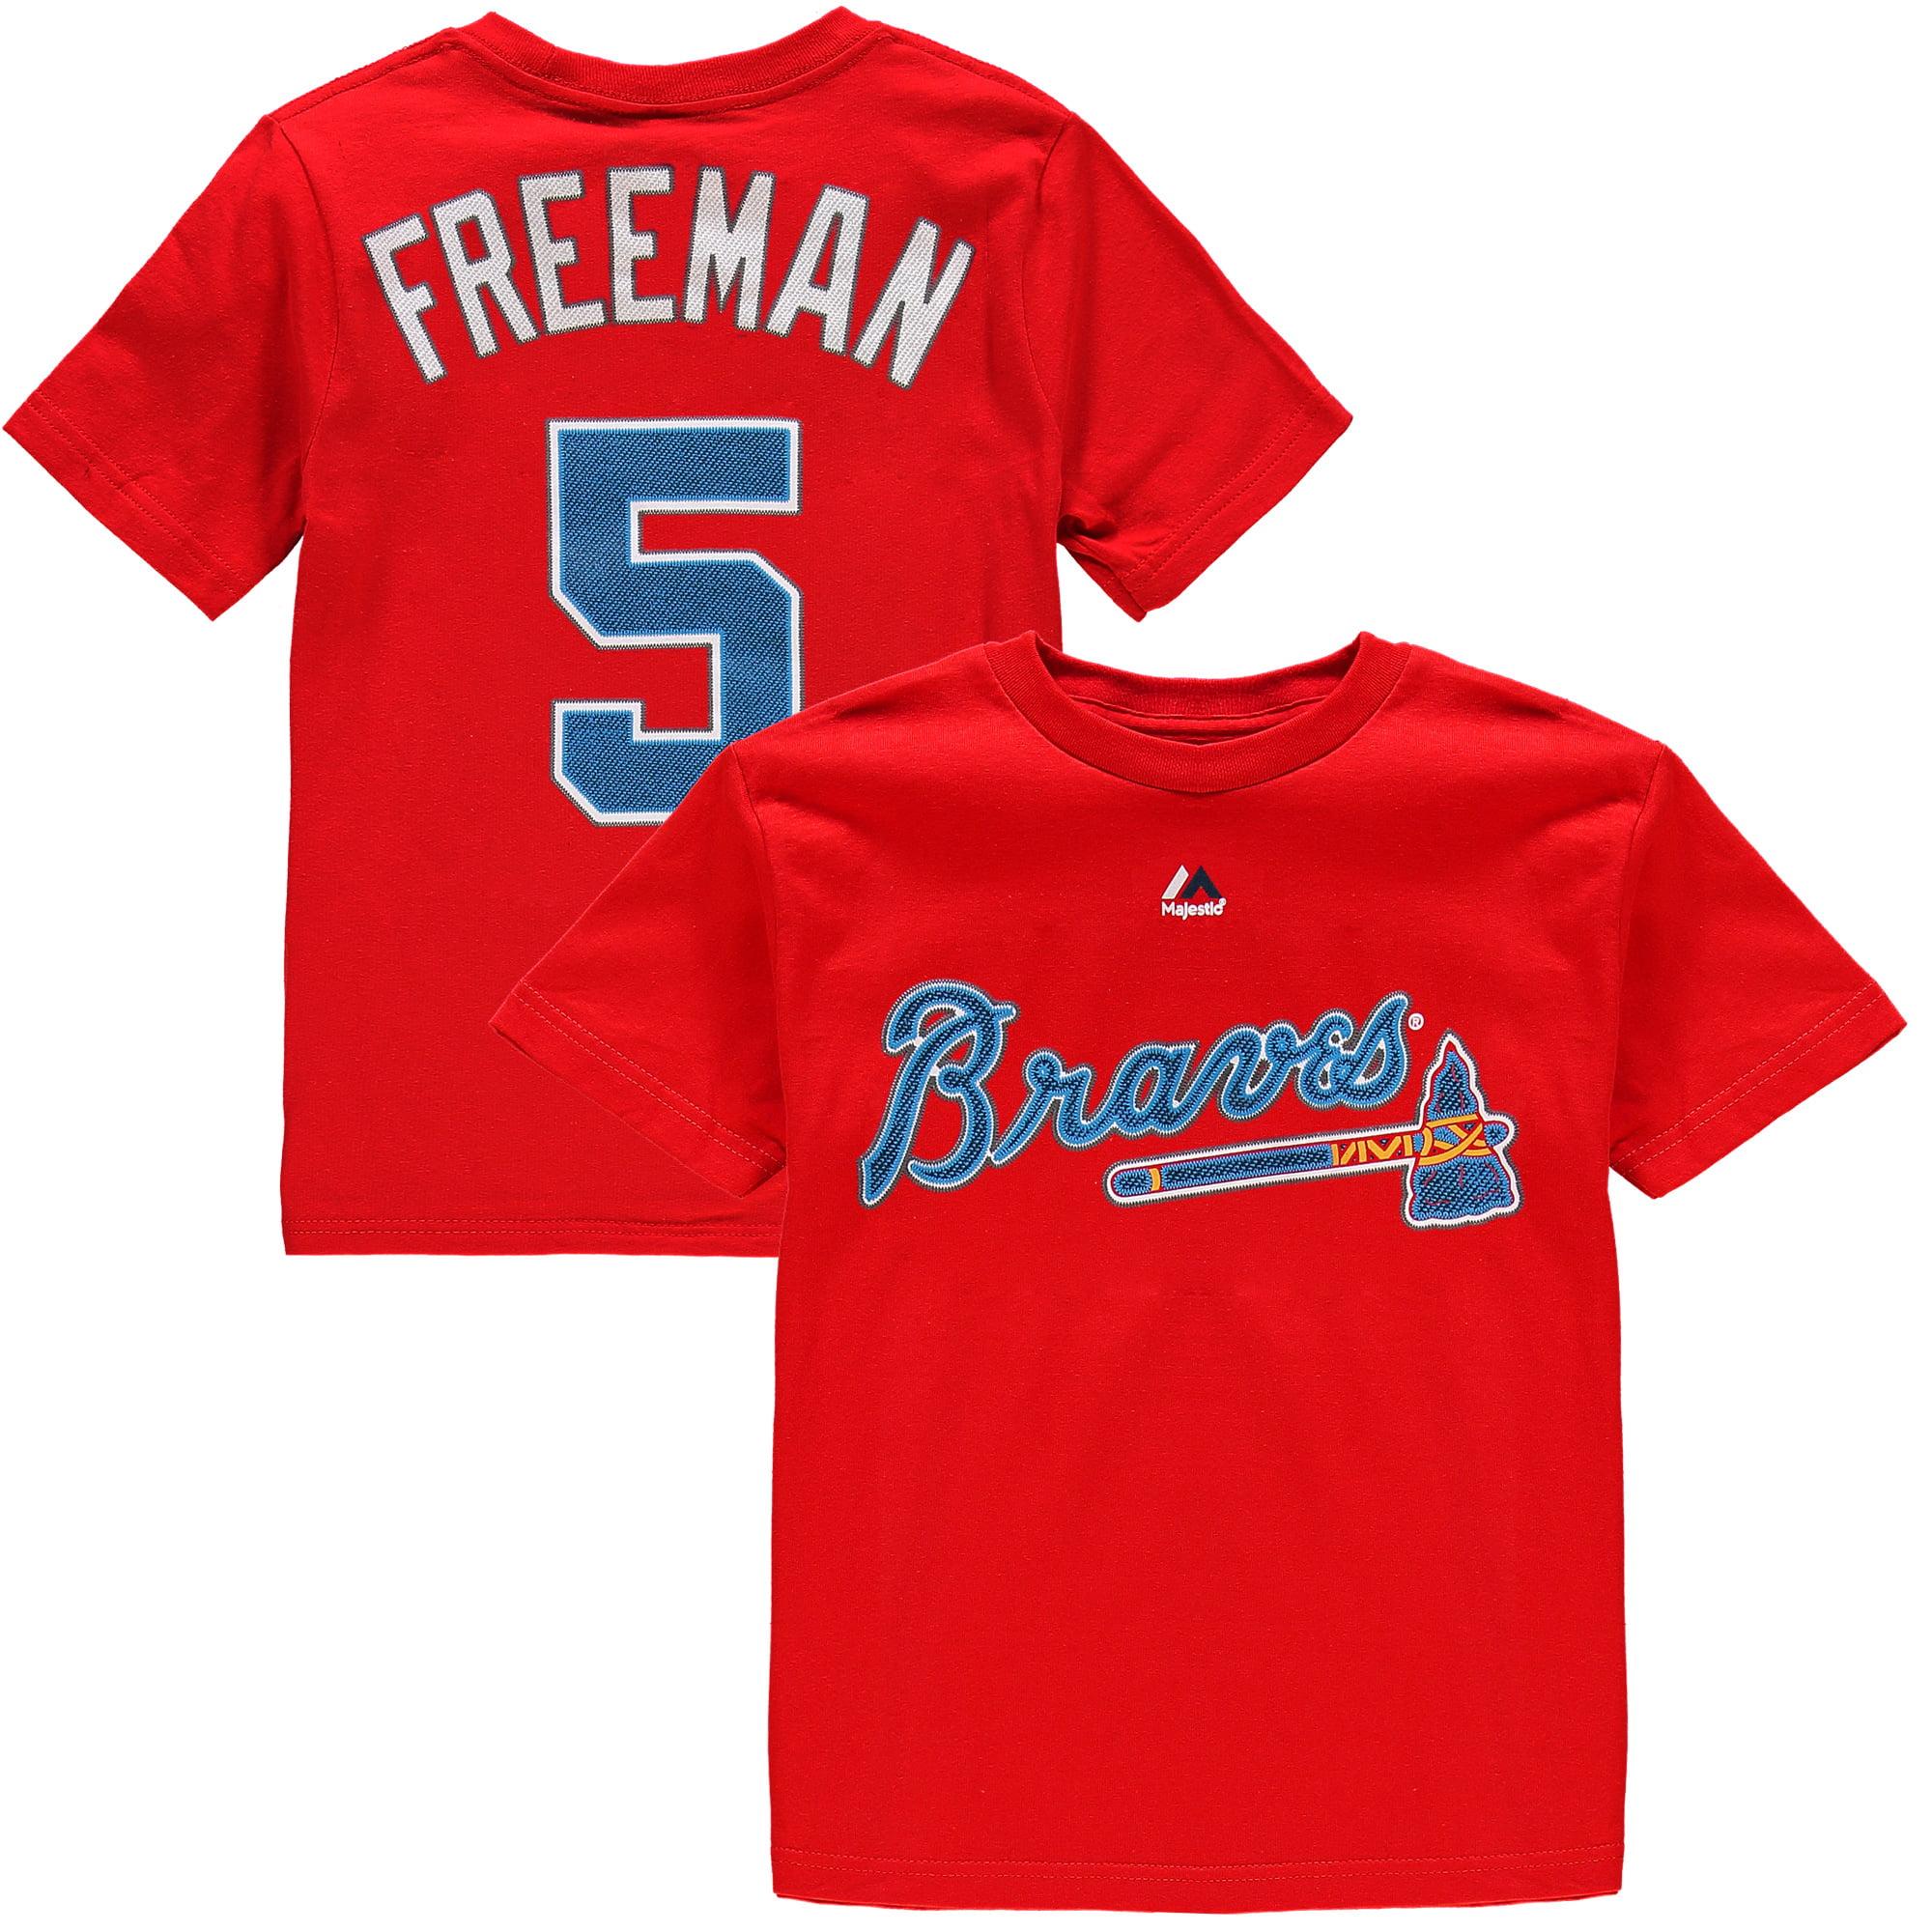 Freddie Freeman Atlanta Braves Majestic Youth Player Name & Number T-Shirt - Red